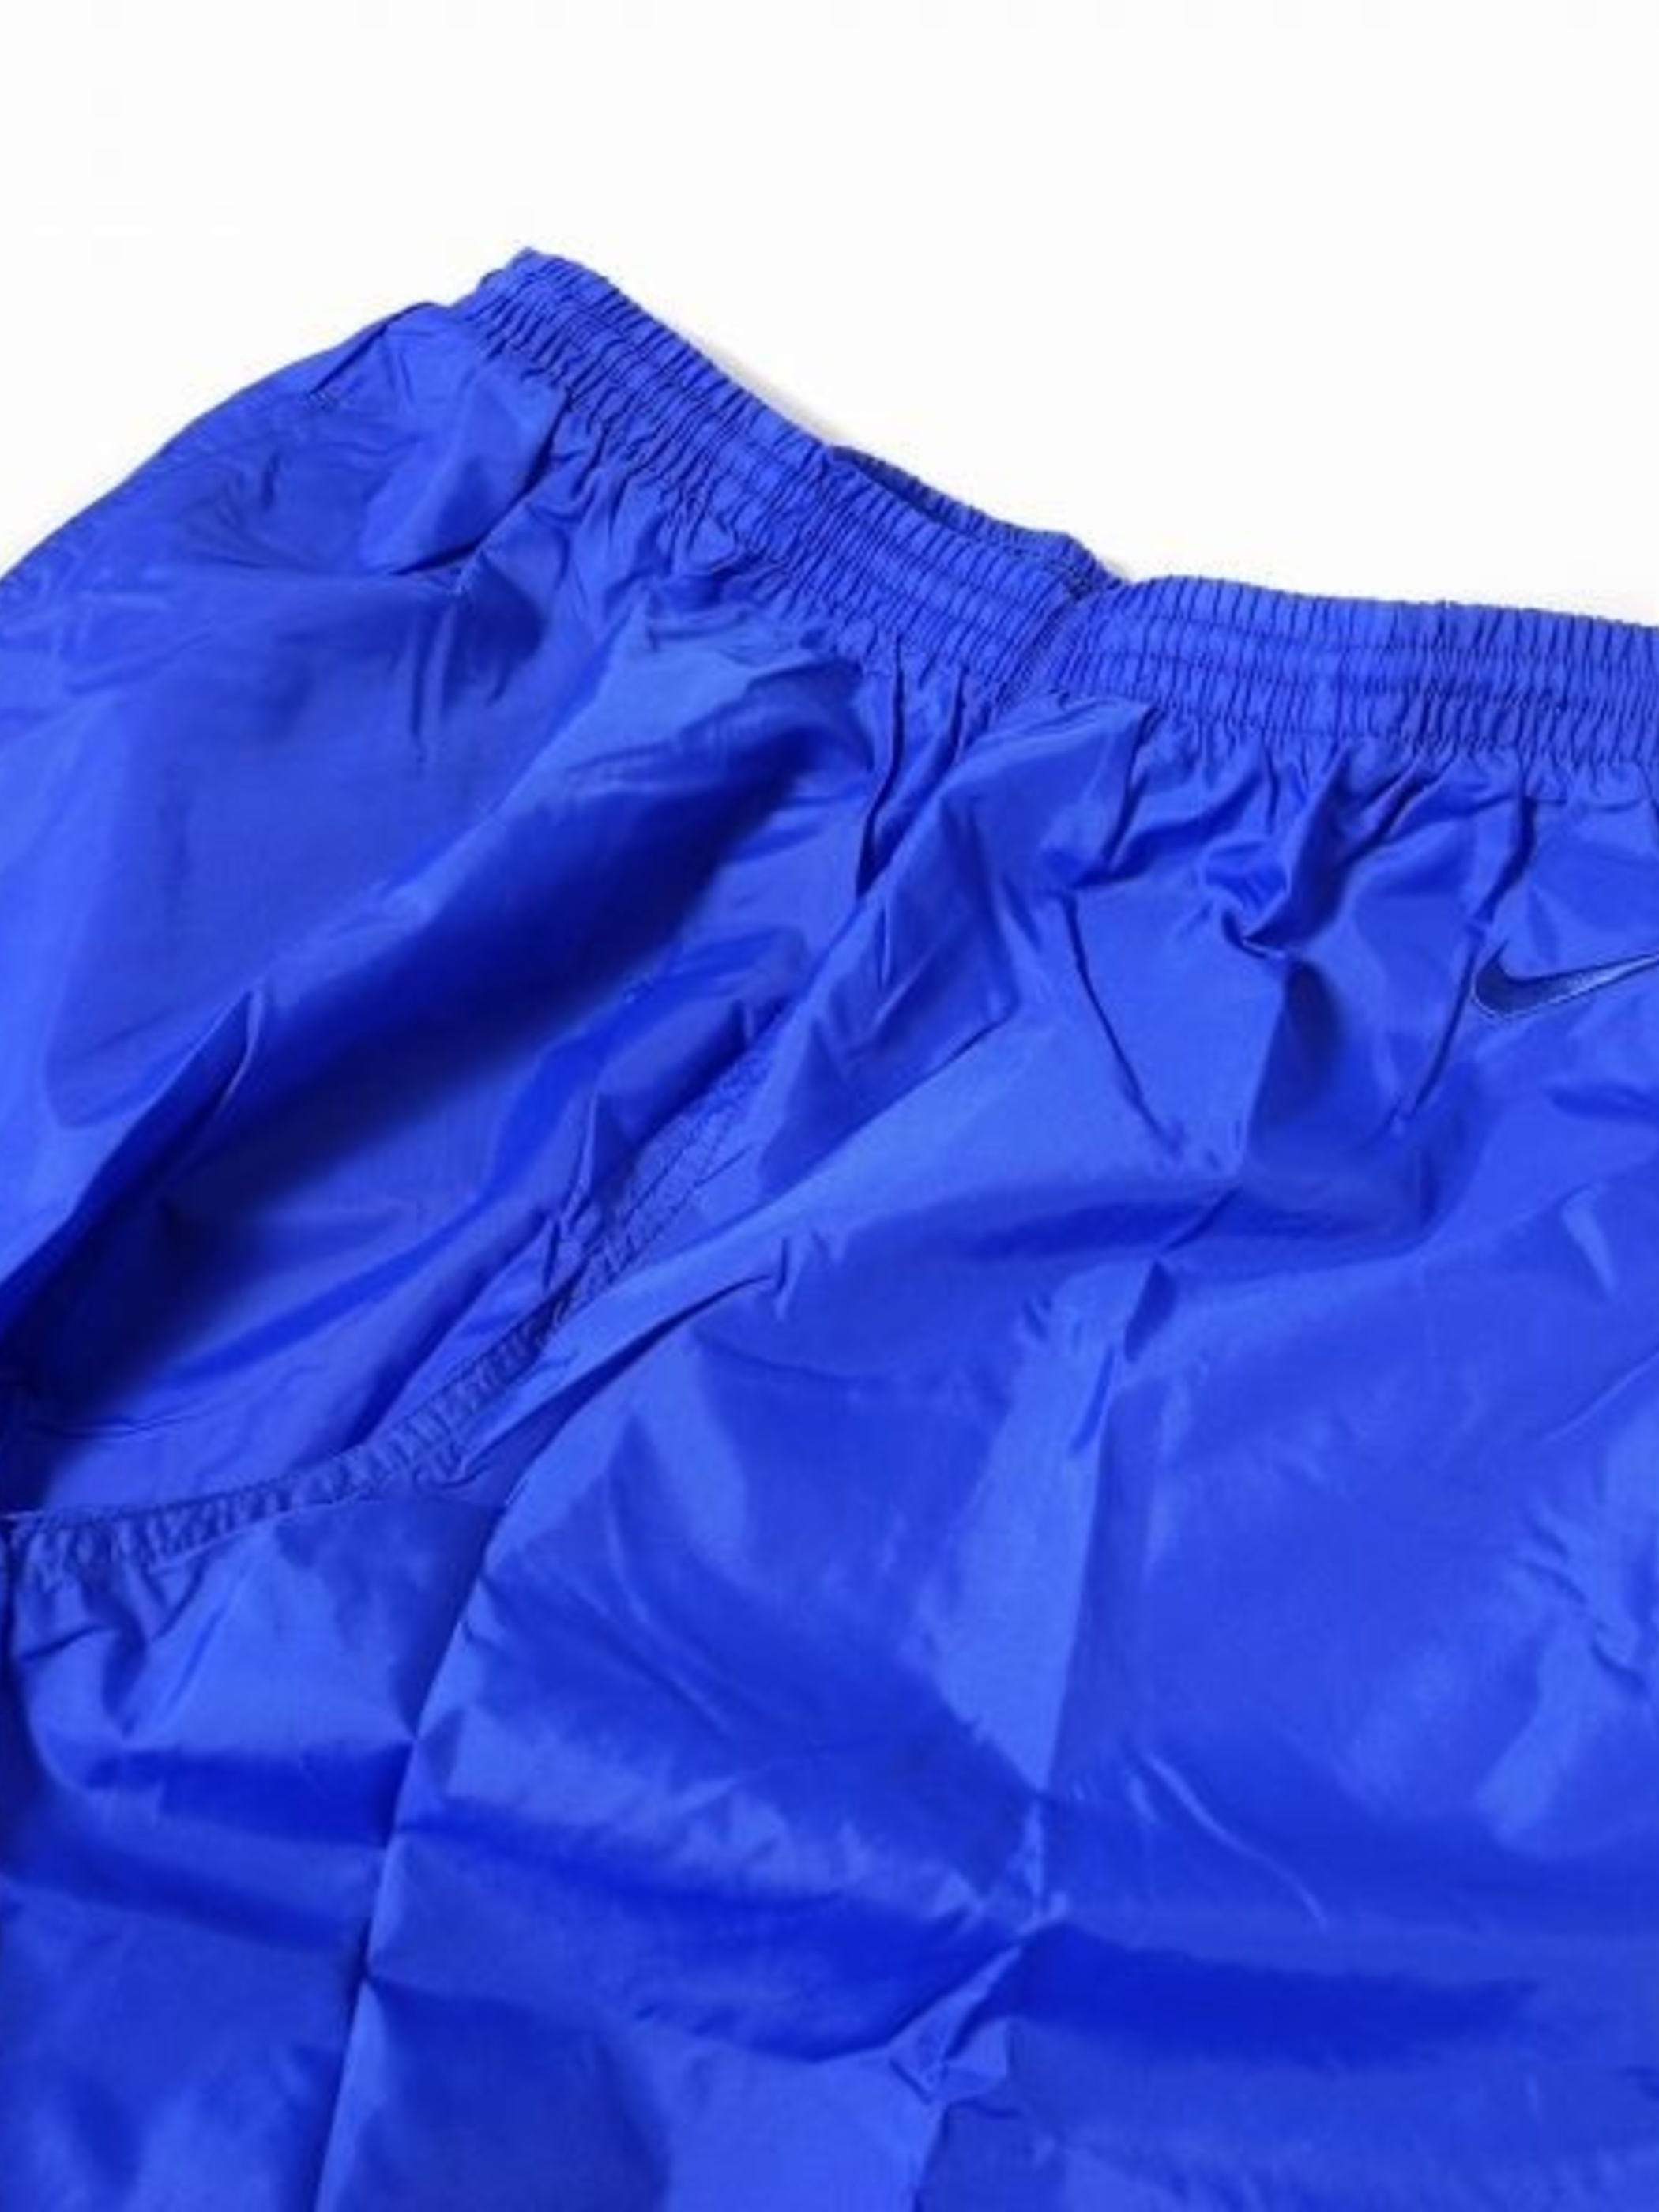 DEADSTOCK NIKE NYLON PANTS BLUE